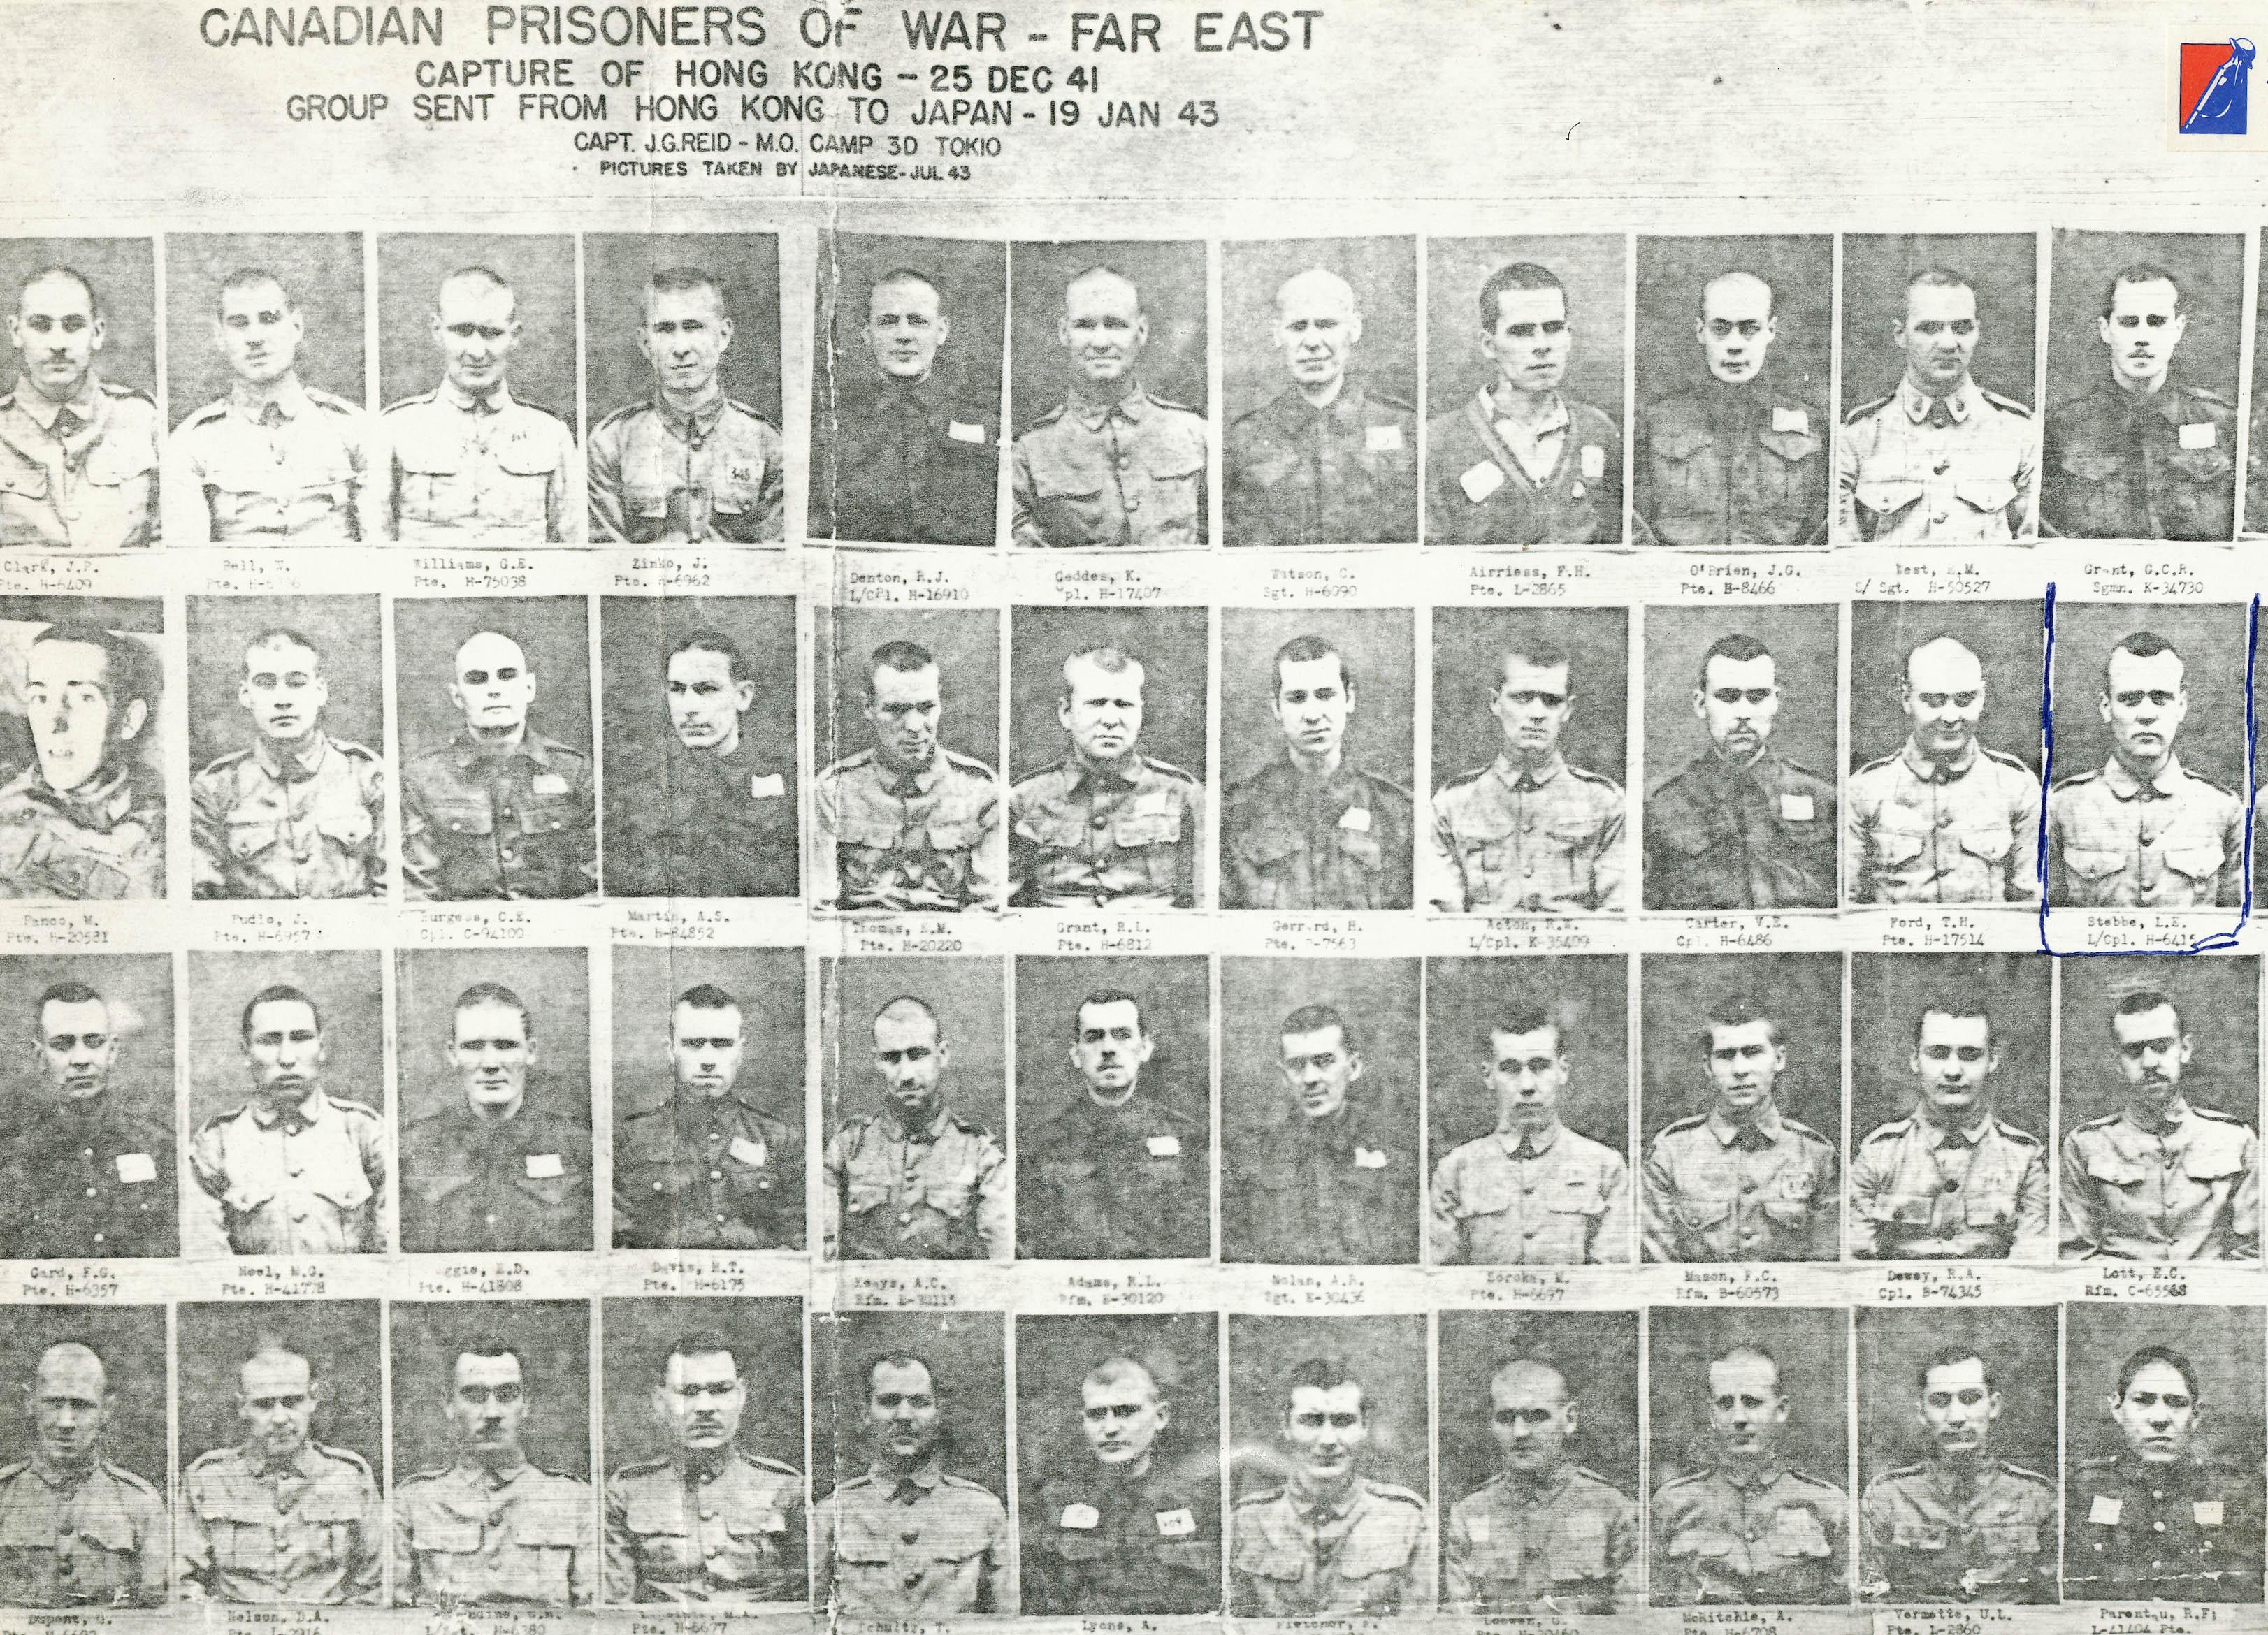 Canadian Prisoners of War